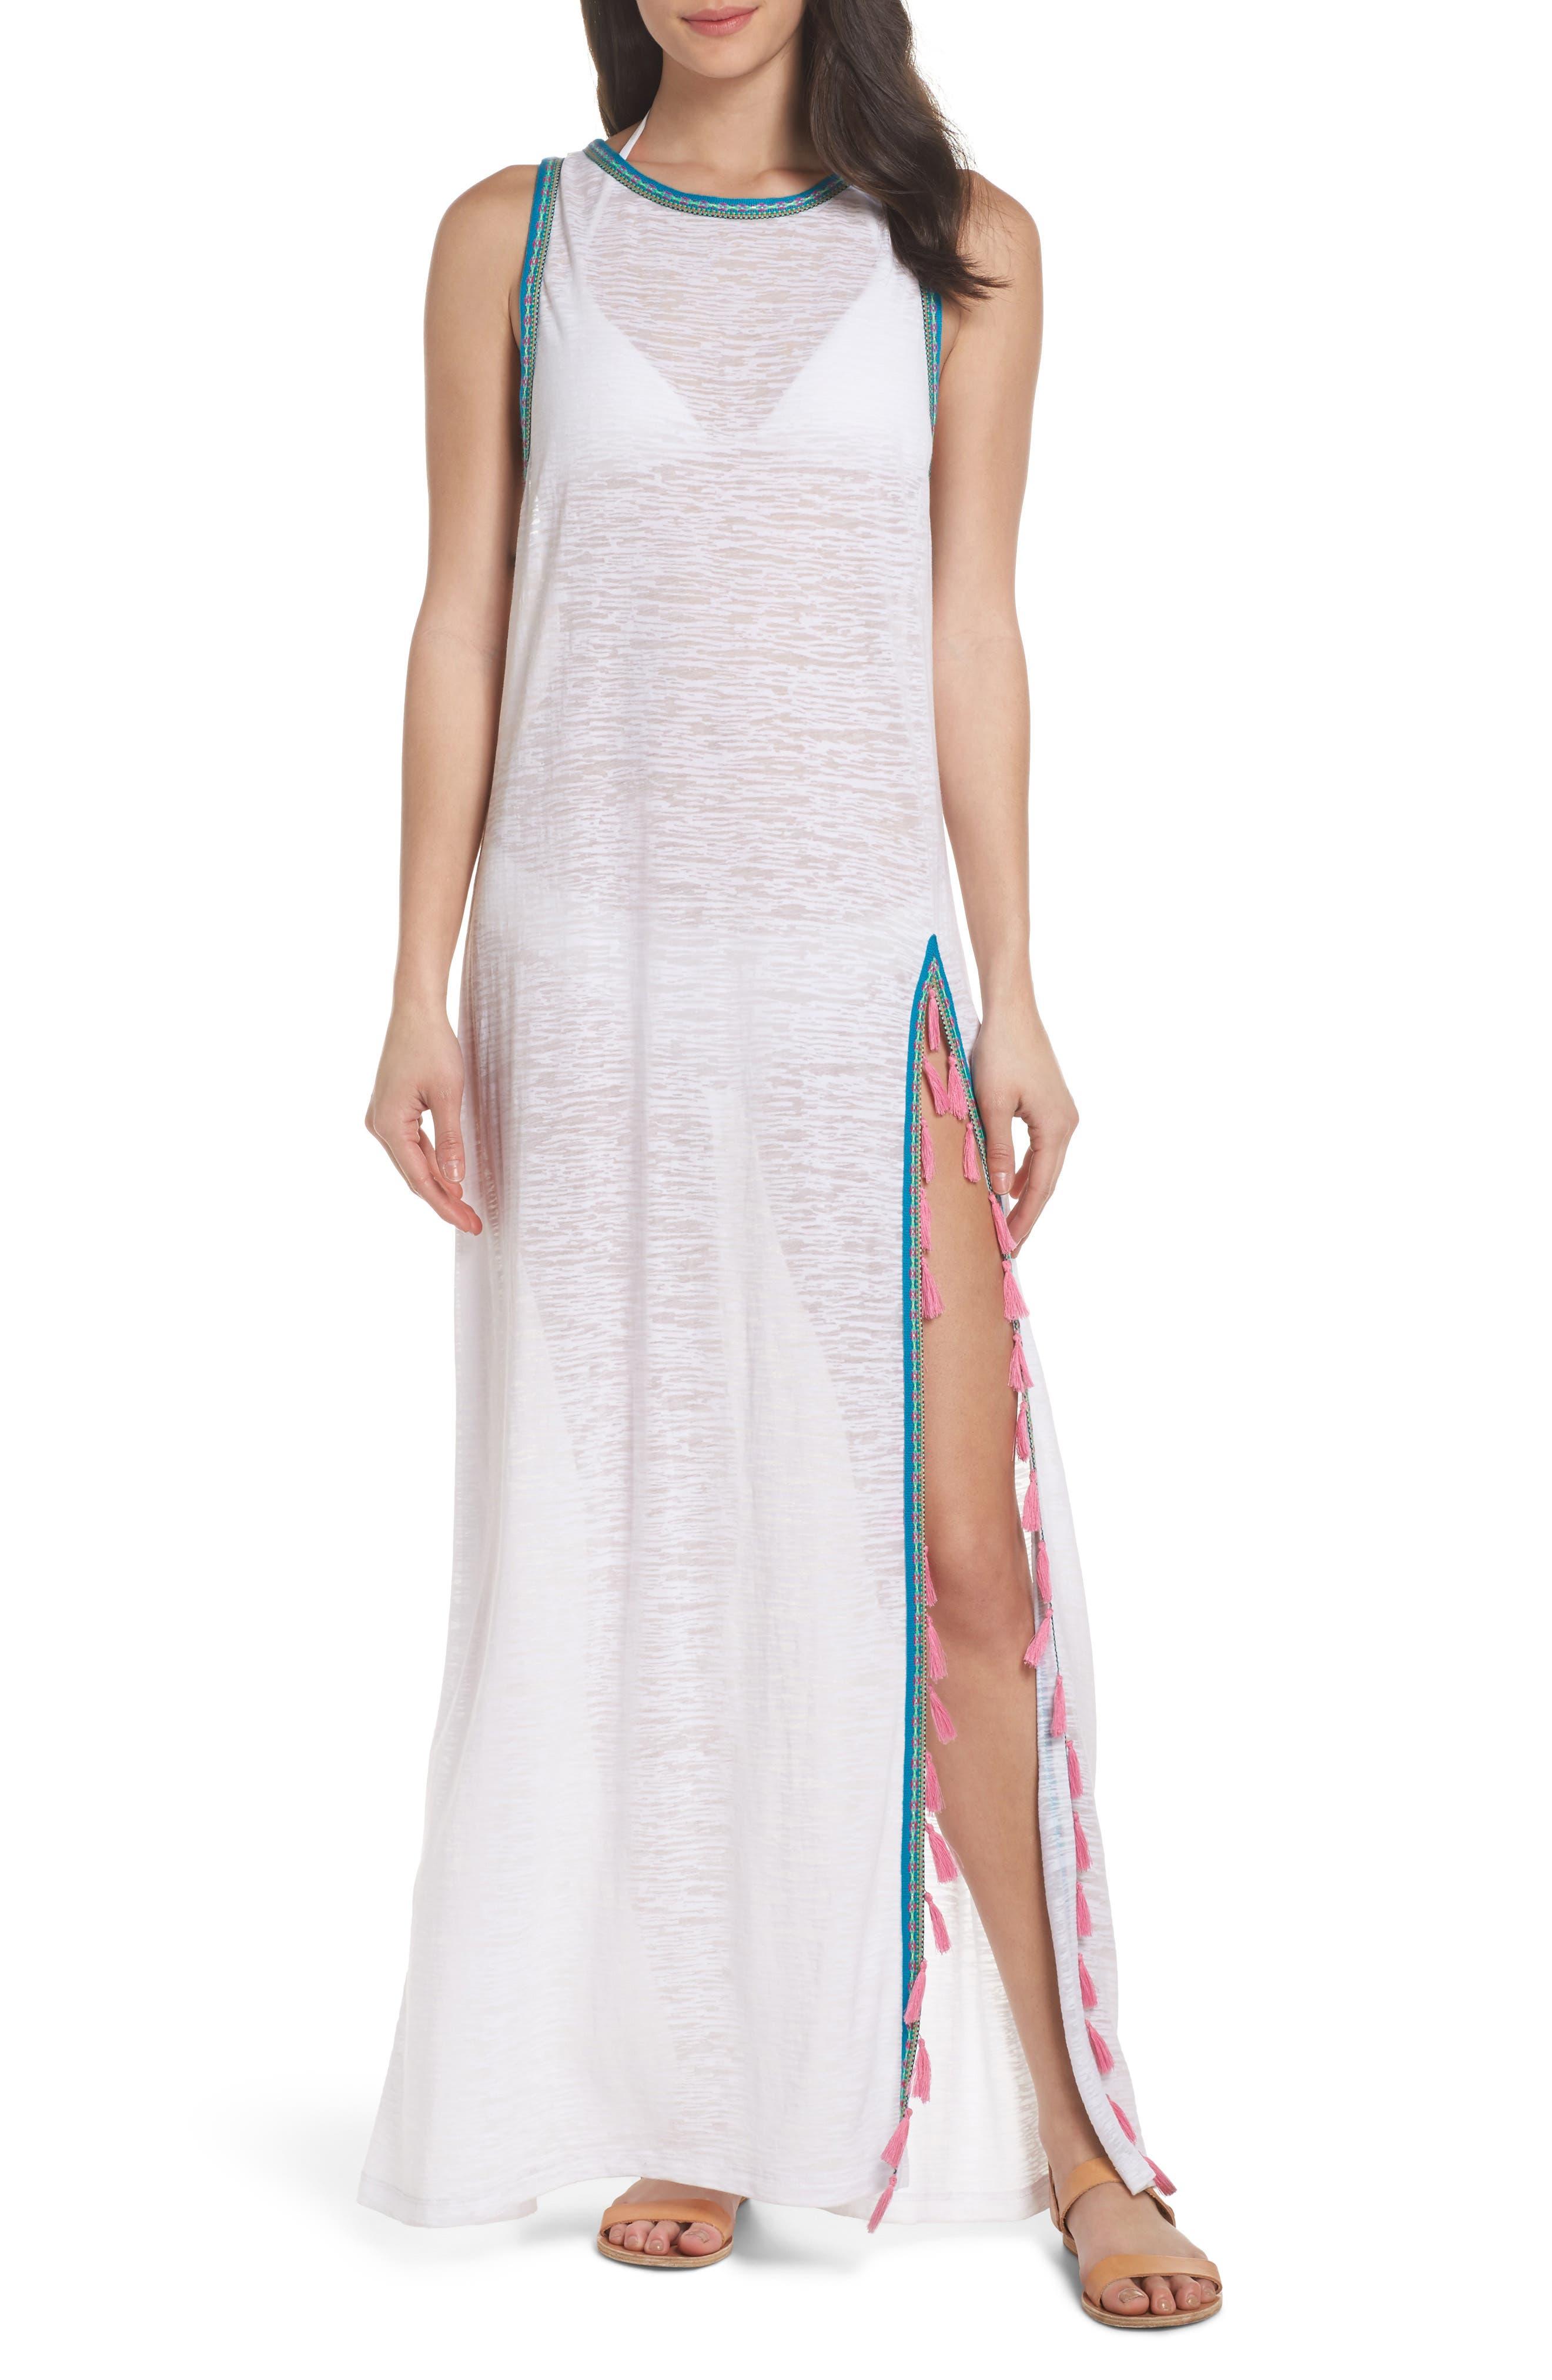 PITUSA Tassel Slit Cover-Up Maxi Dress